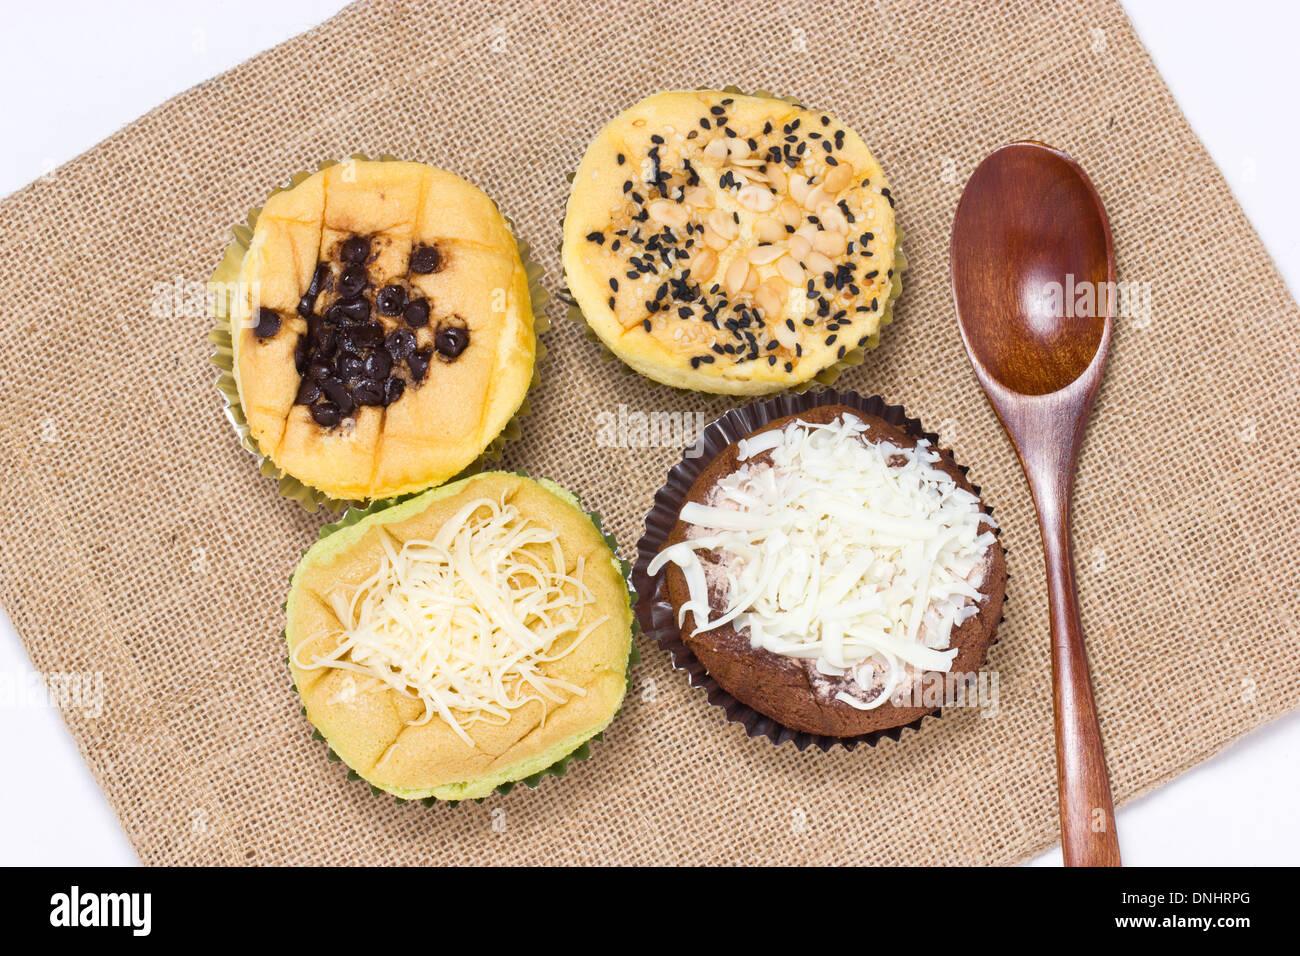 Philippines sponge cake call mamon. - Stock Image